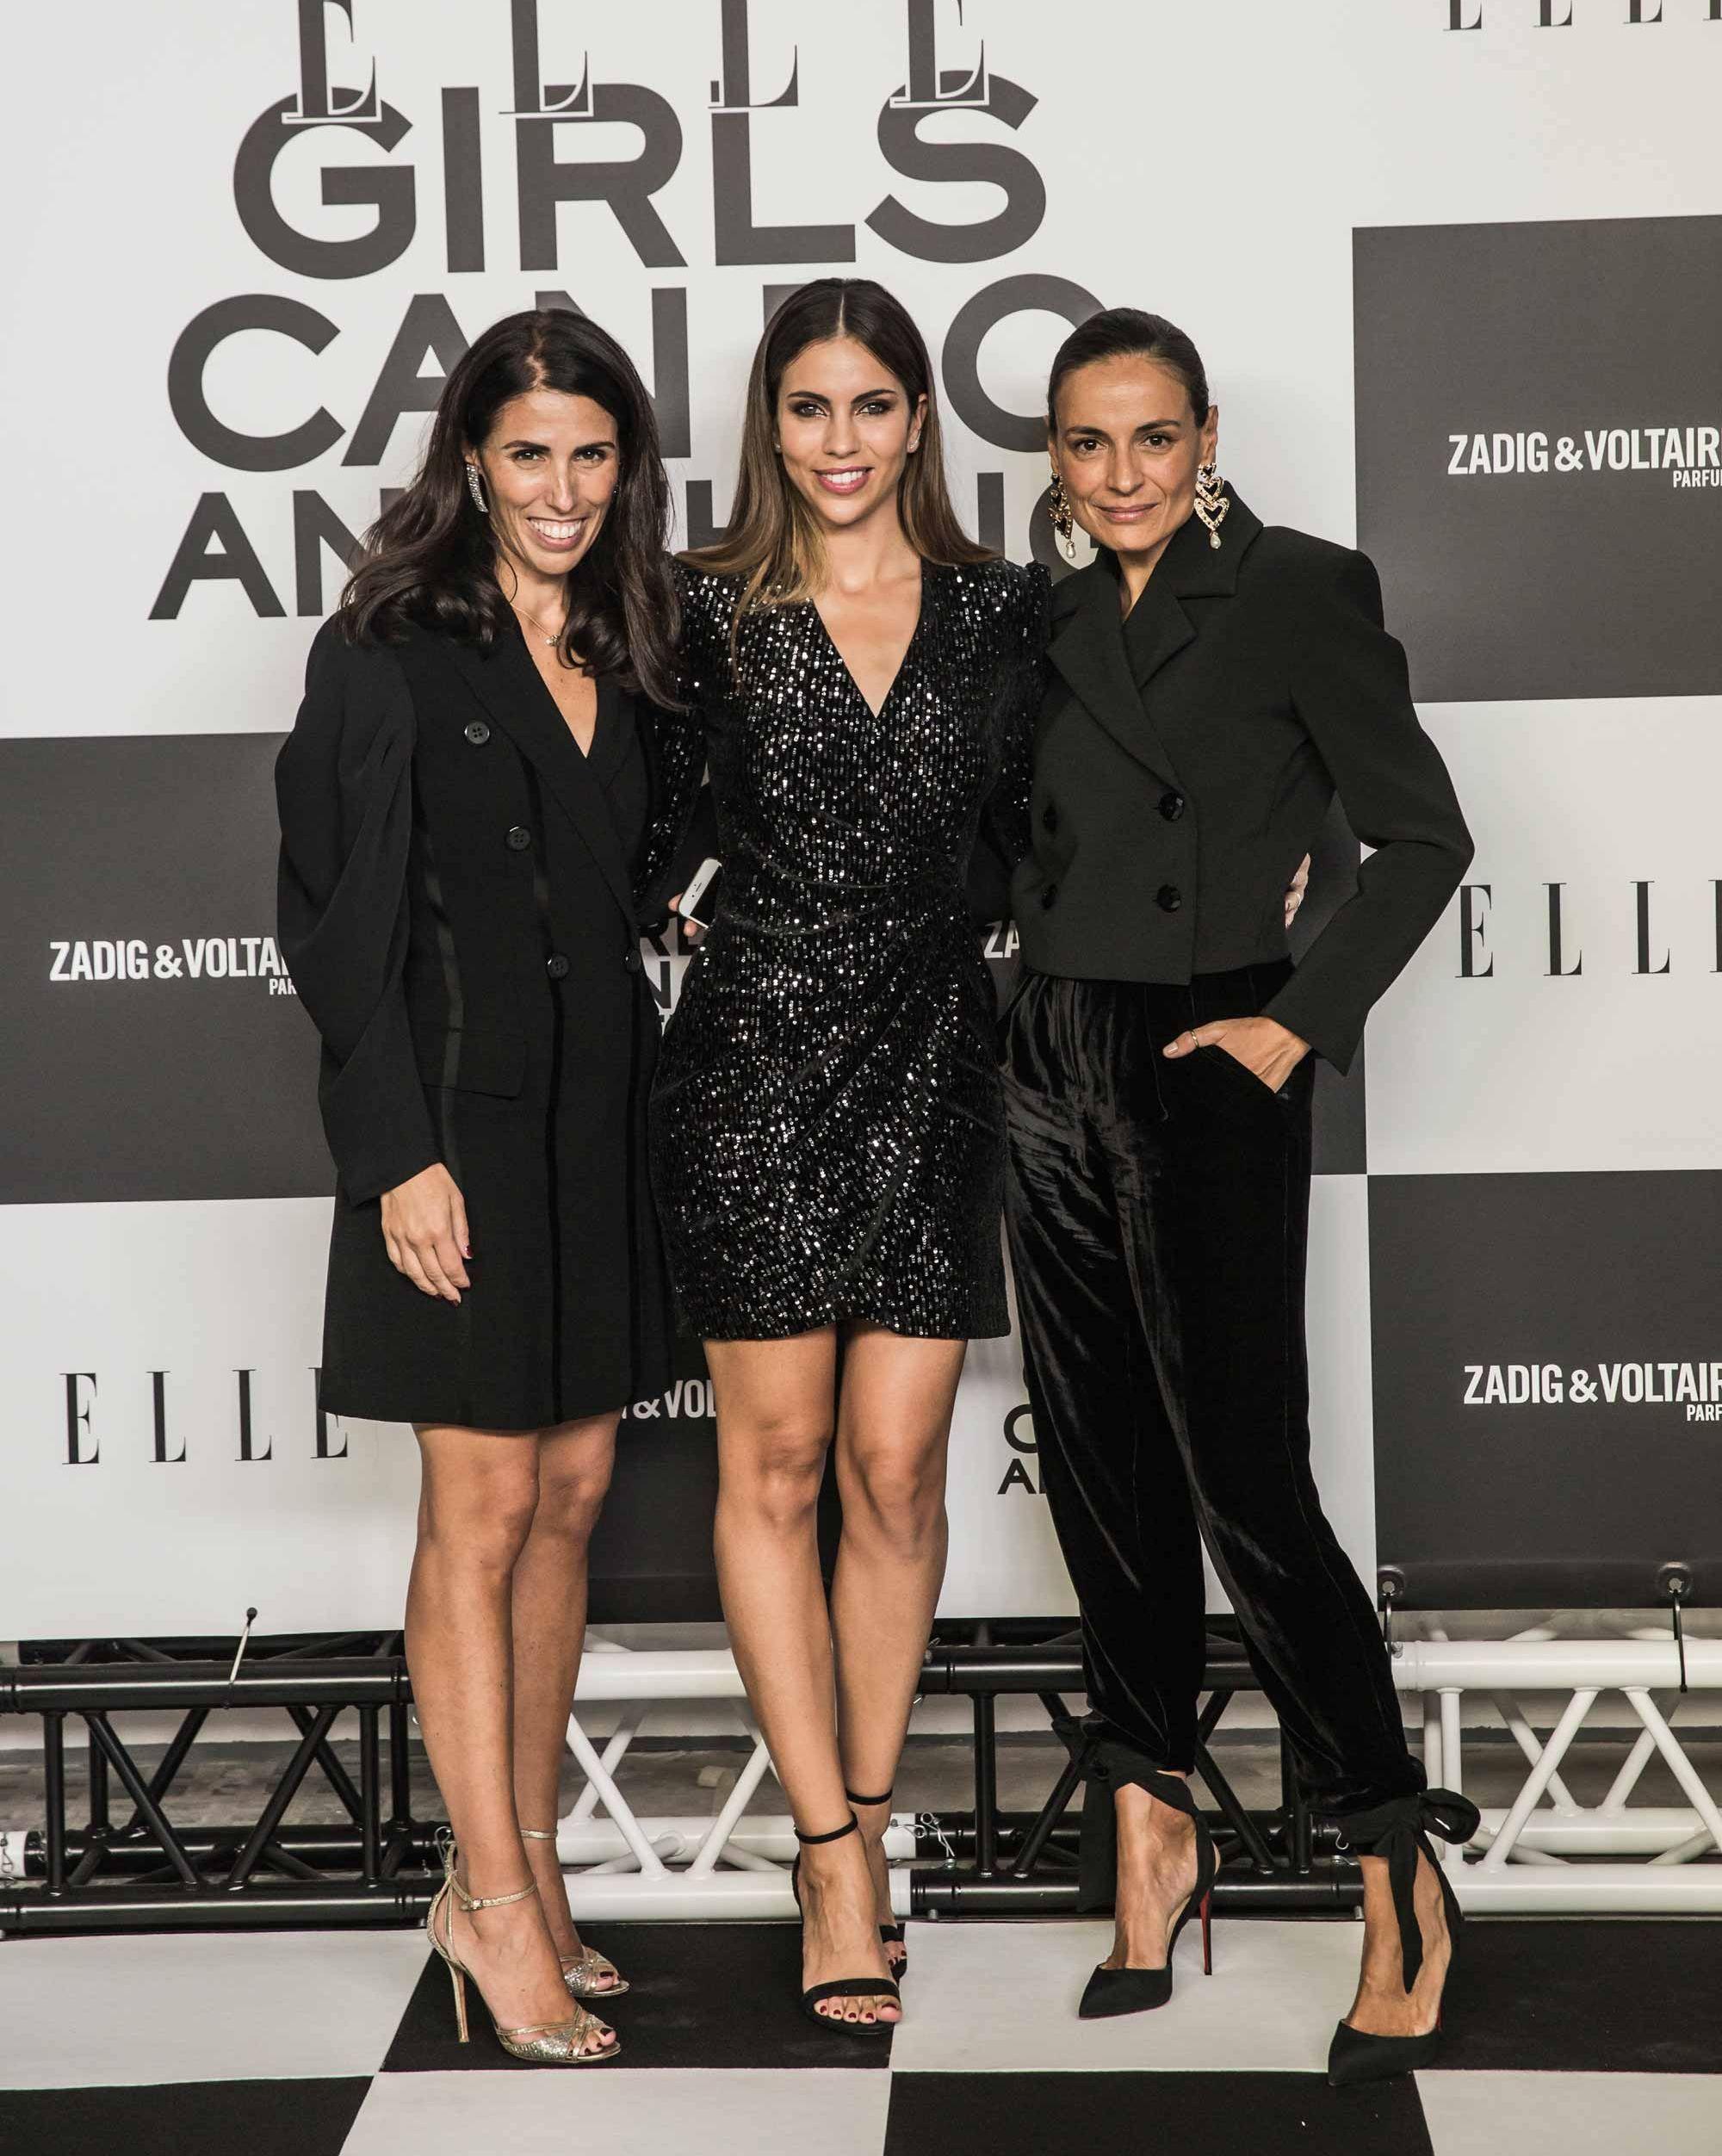 Benedetta Poletti, Melissa Jiménez e Inma Jiménez en la Fiesta ELLE y Zadig & Voltaire 'ELLE Girls can do anything'.